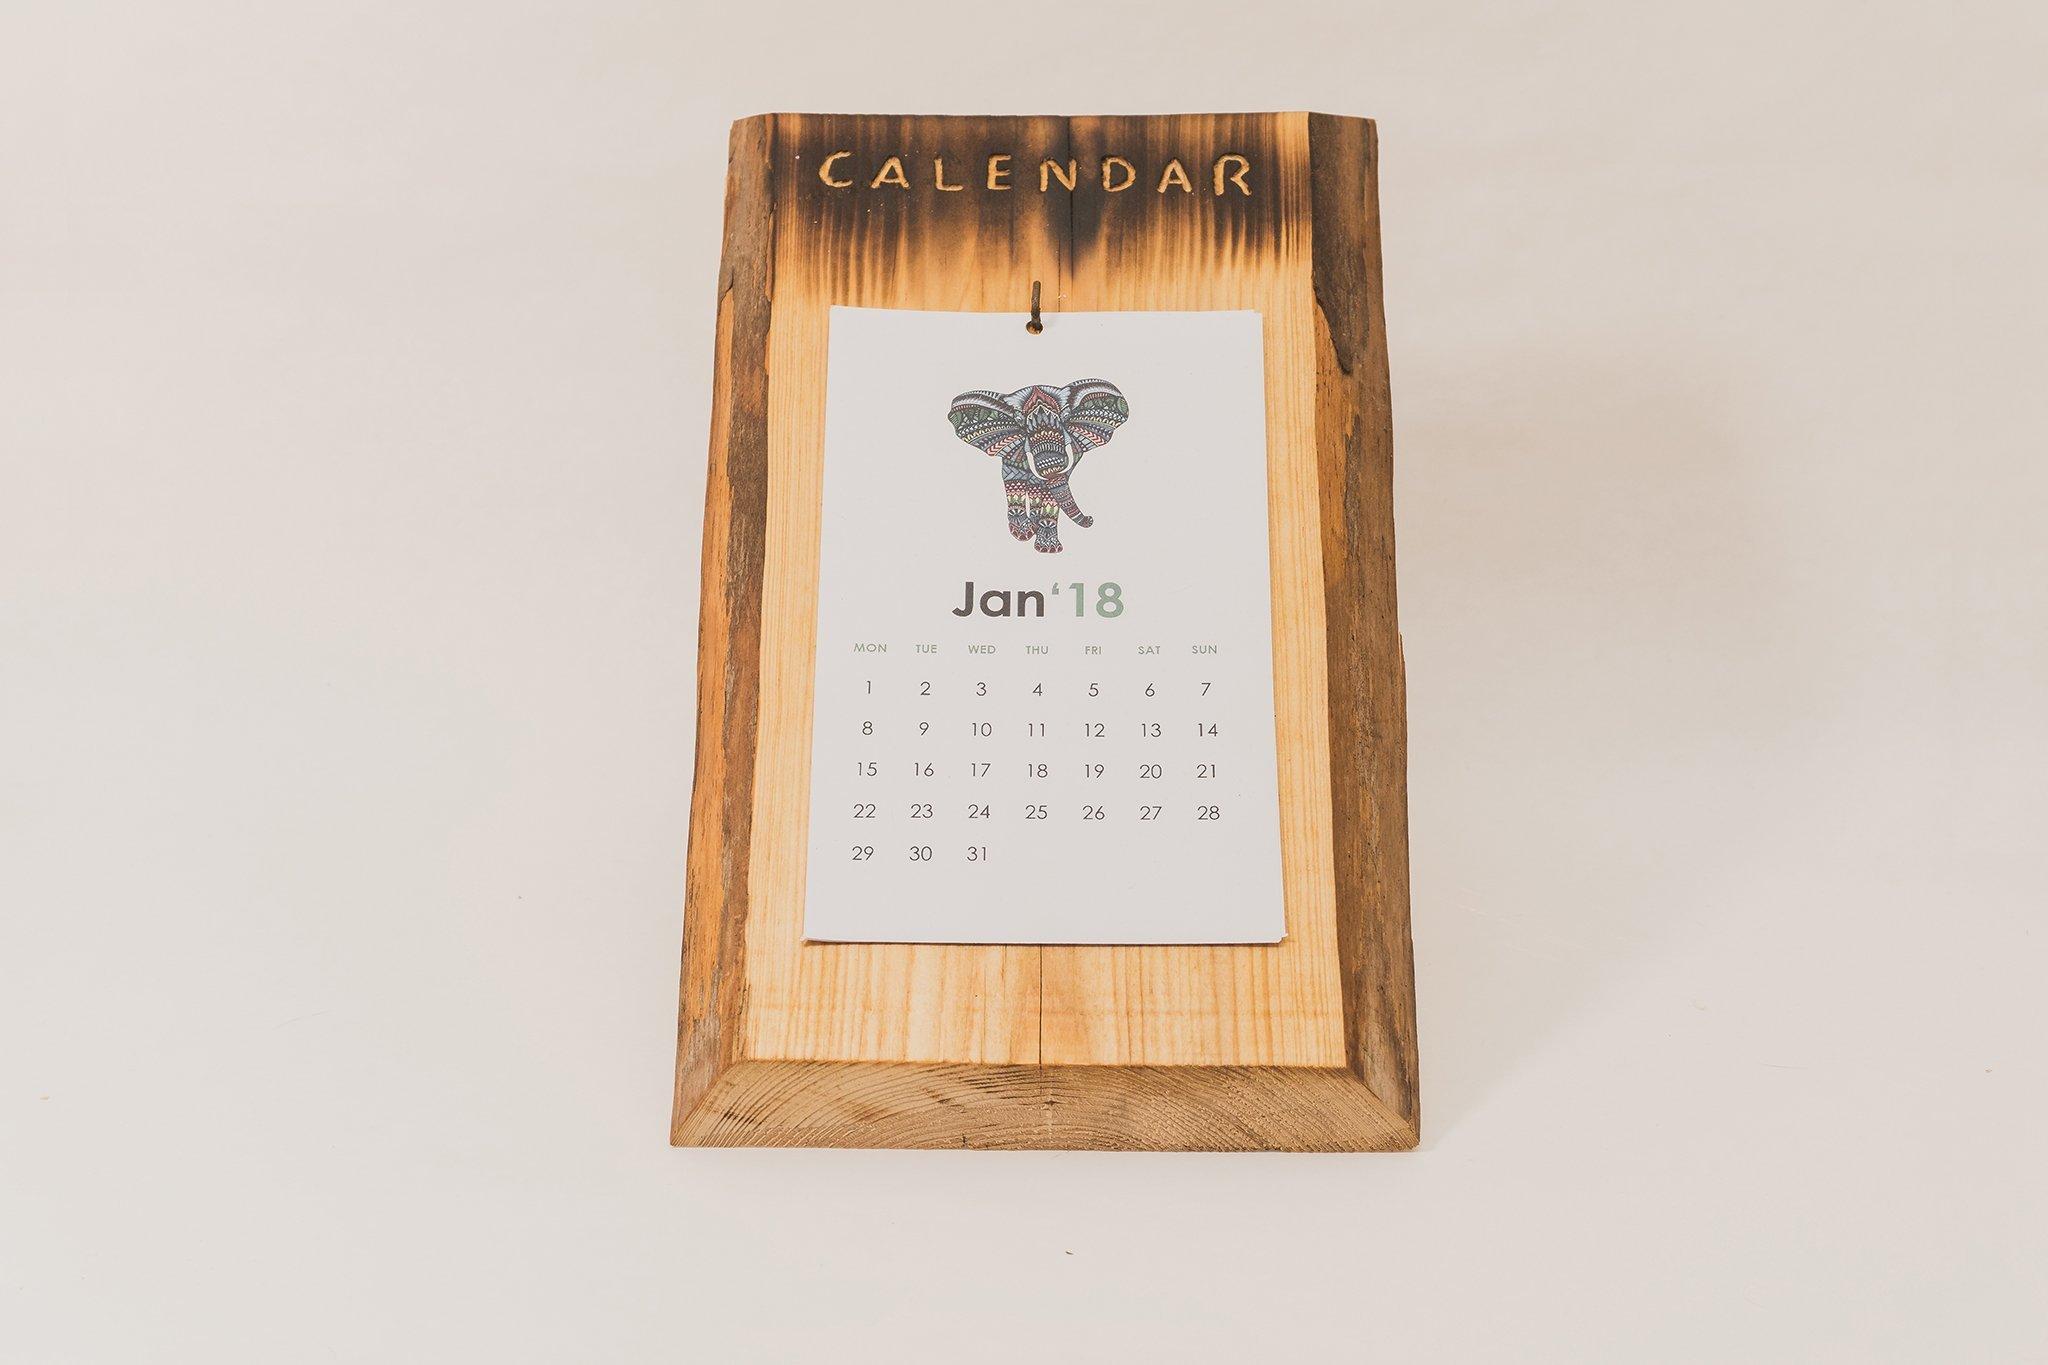 Wood wall calendar, Wood calendar, Handmade calendar, rustic calendar, eco calendar, reusable calendar, calendar holder, diy calendar